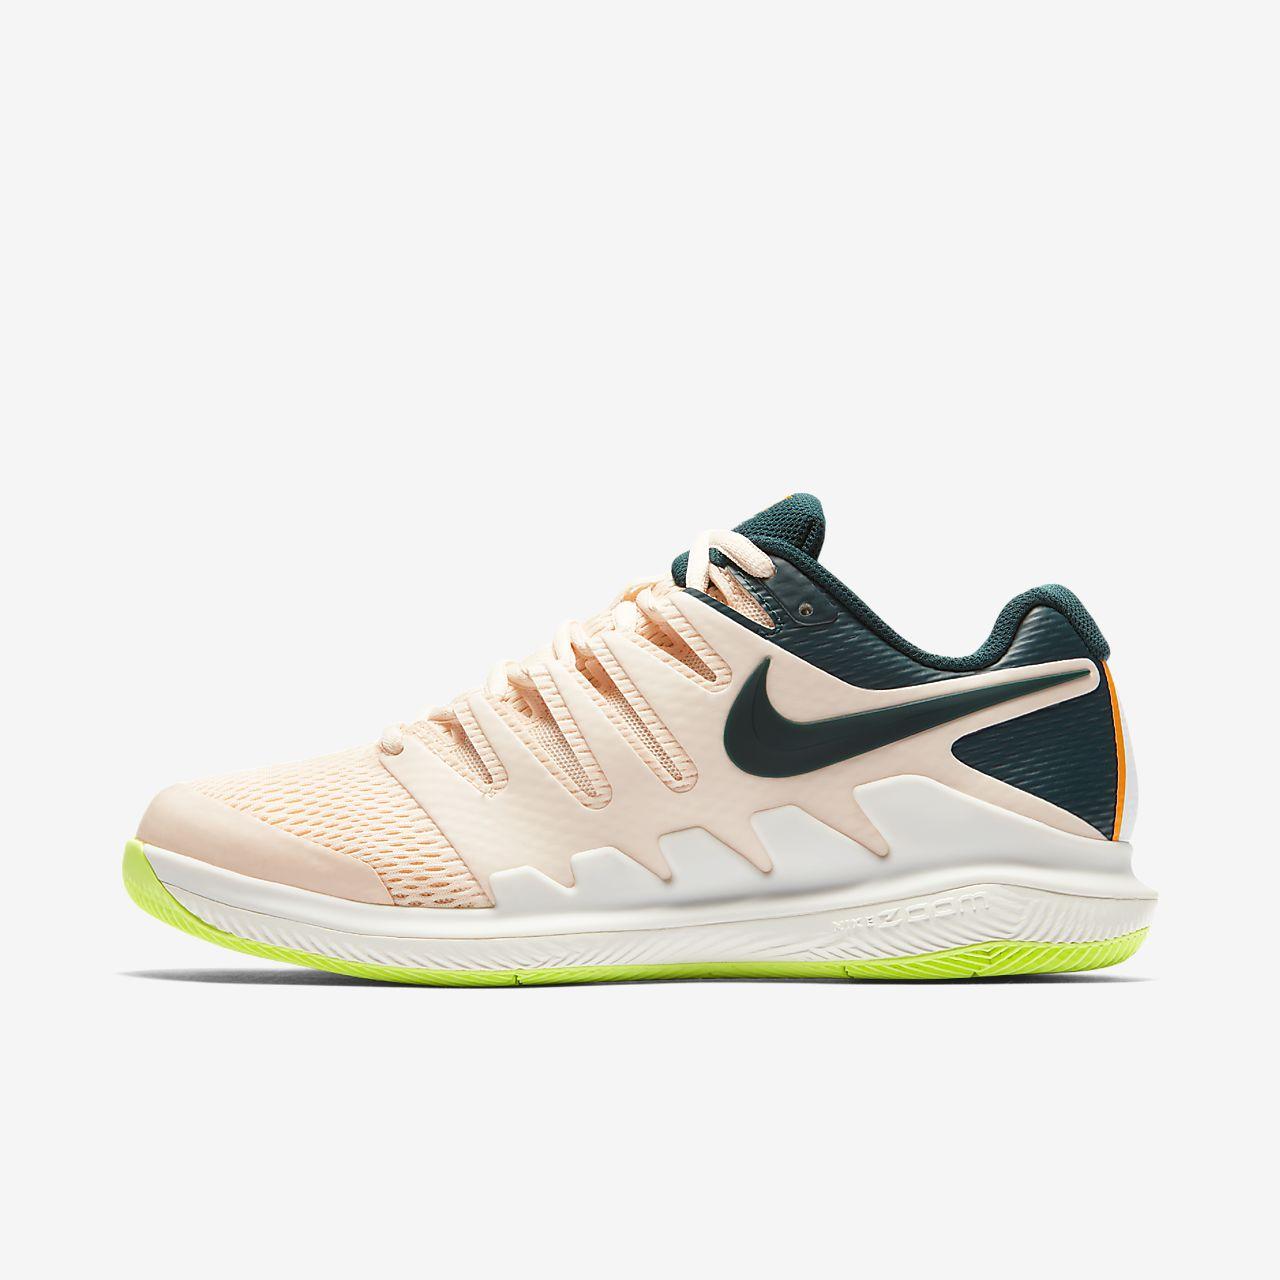 NikeCourt Air Zoom Vapor X Women s Hard Court Tennis Shoe. Nike.com MA 156ec5a40103a